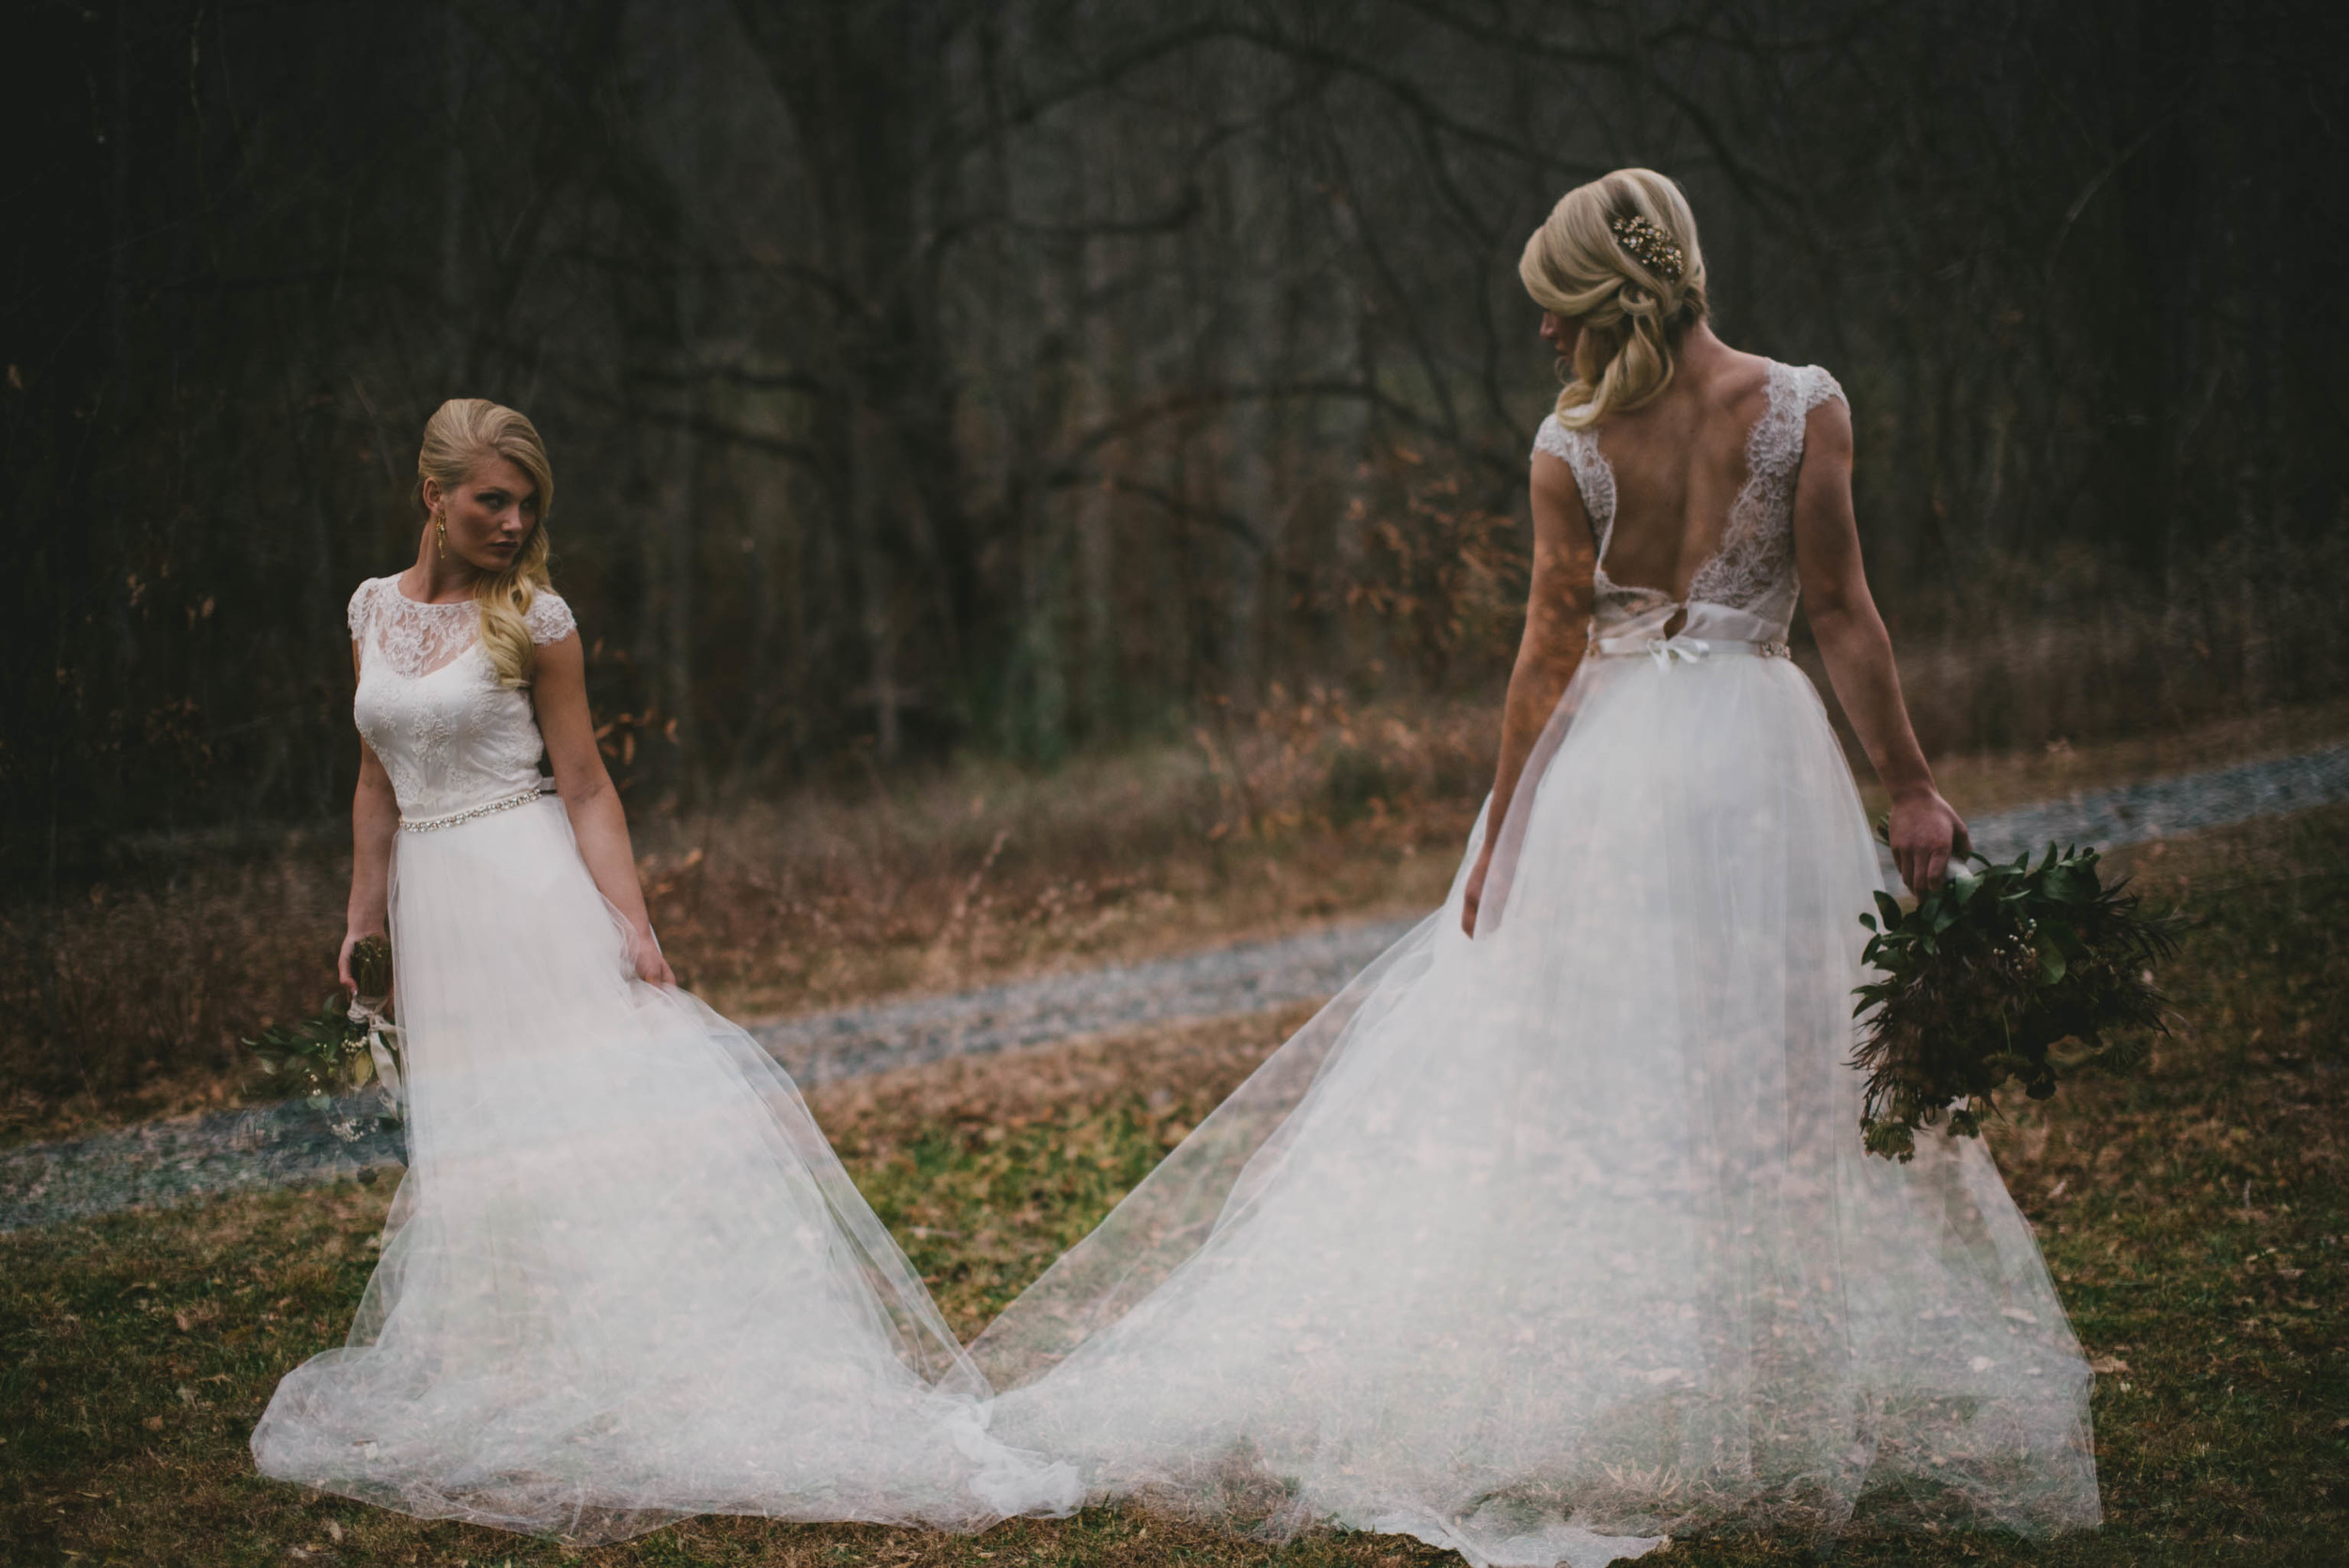 adam-chapin-wedding-photography